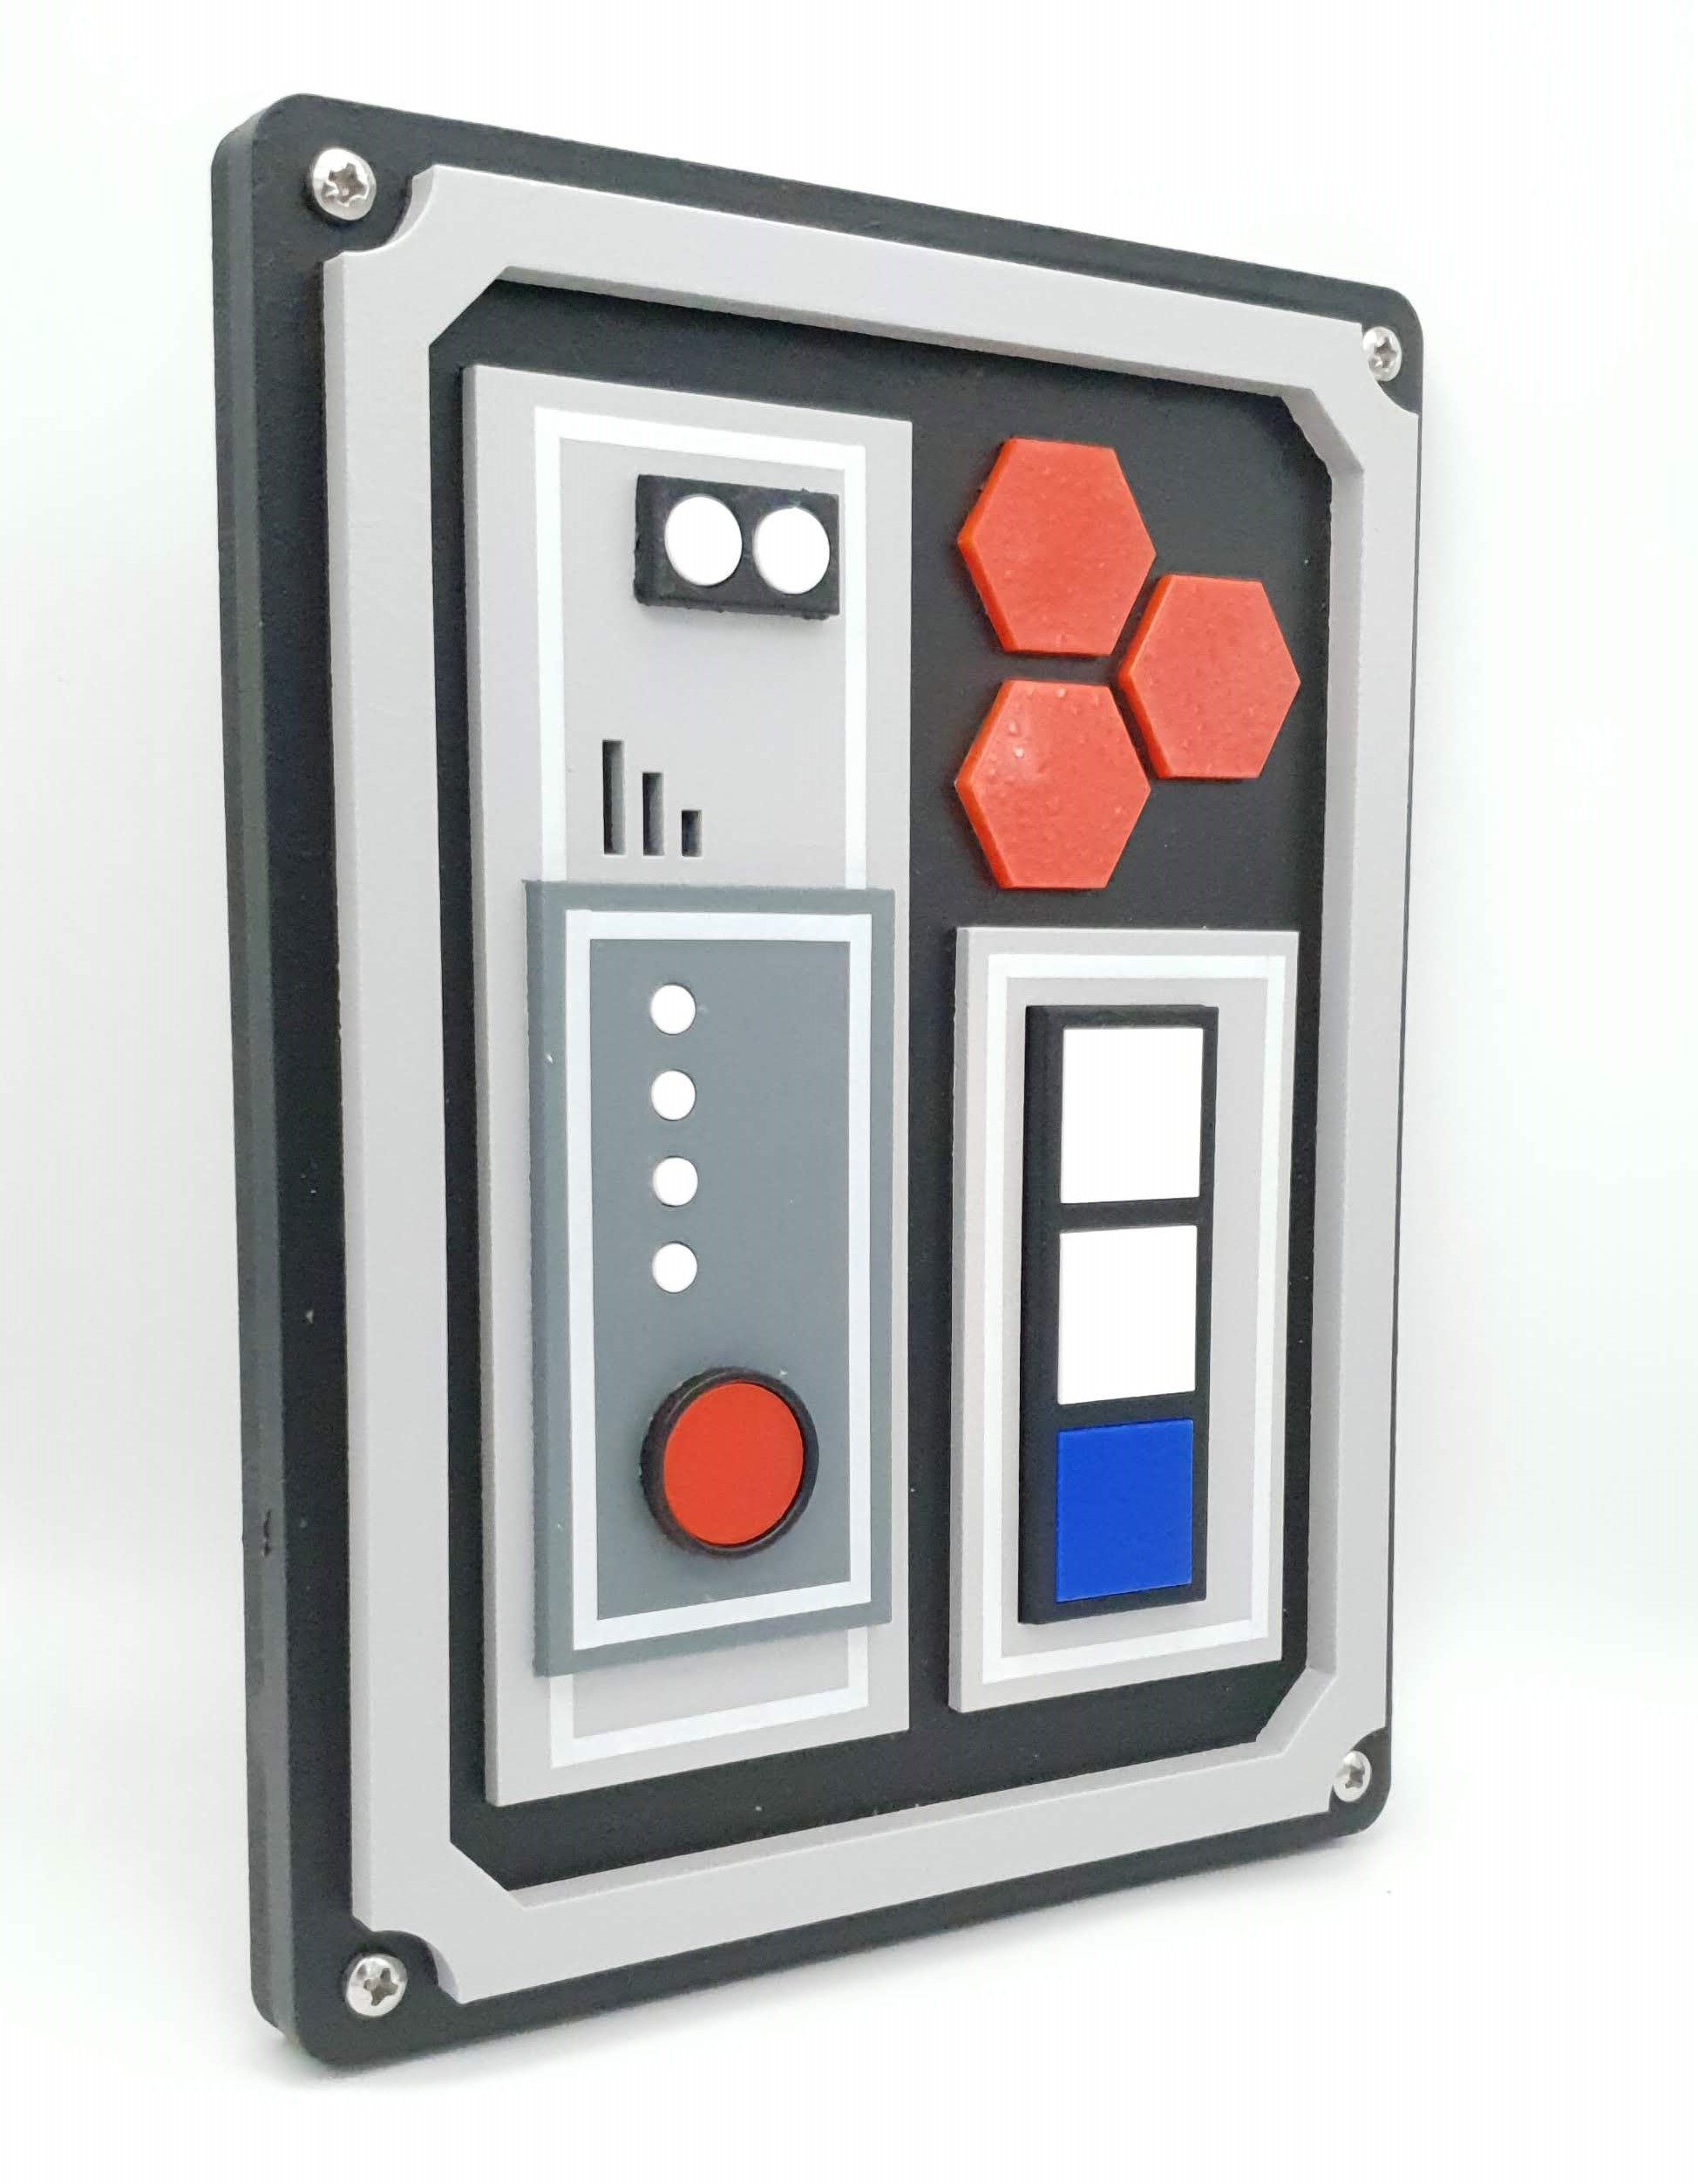 Star Wars control panel